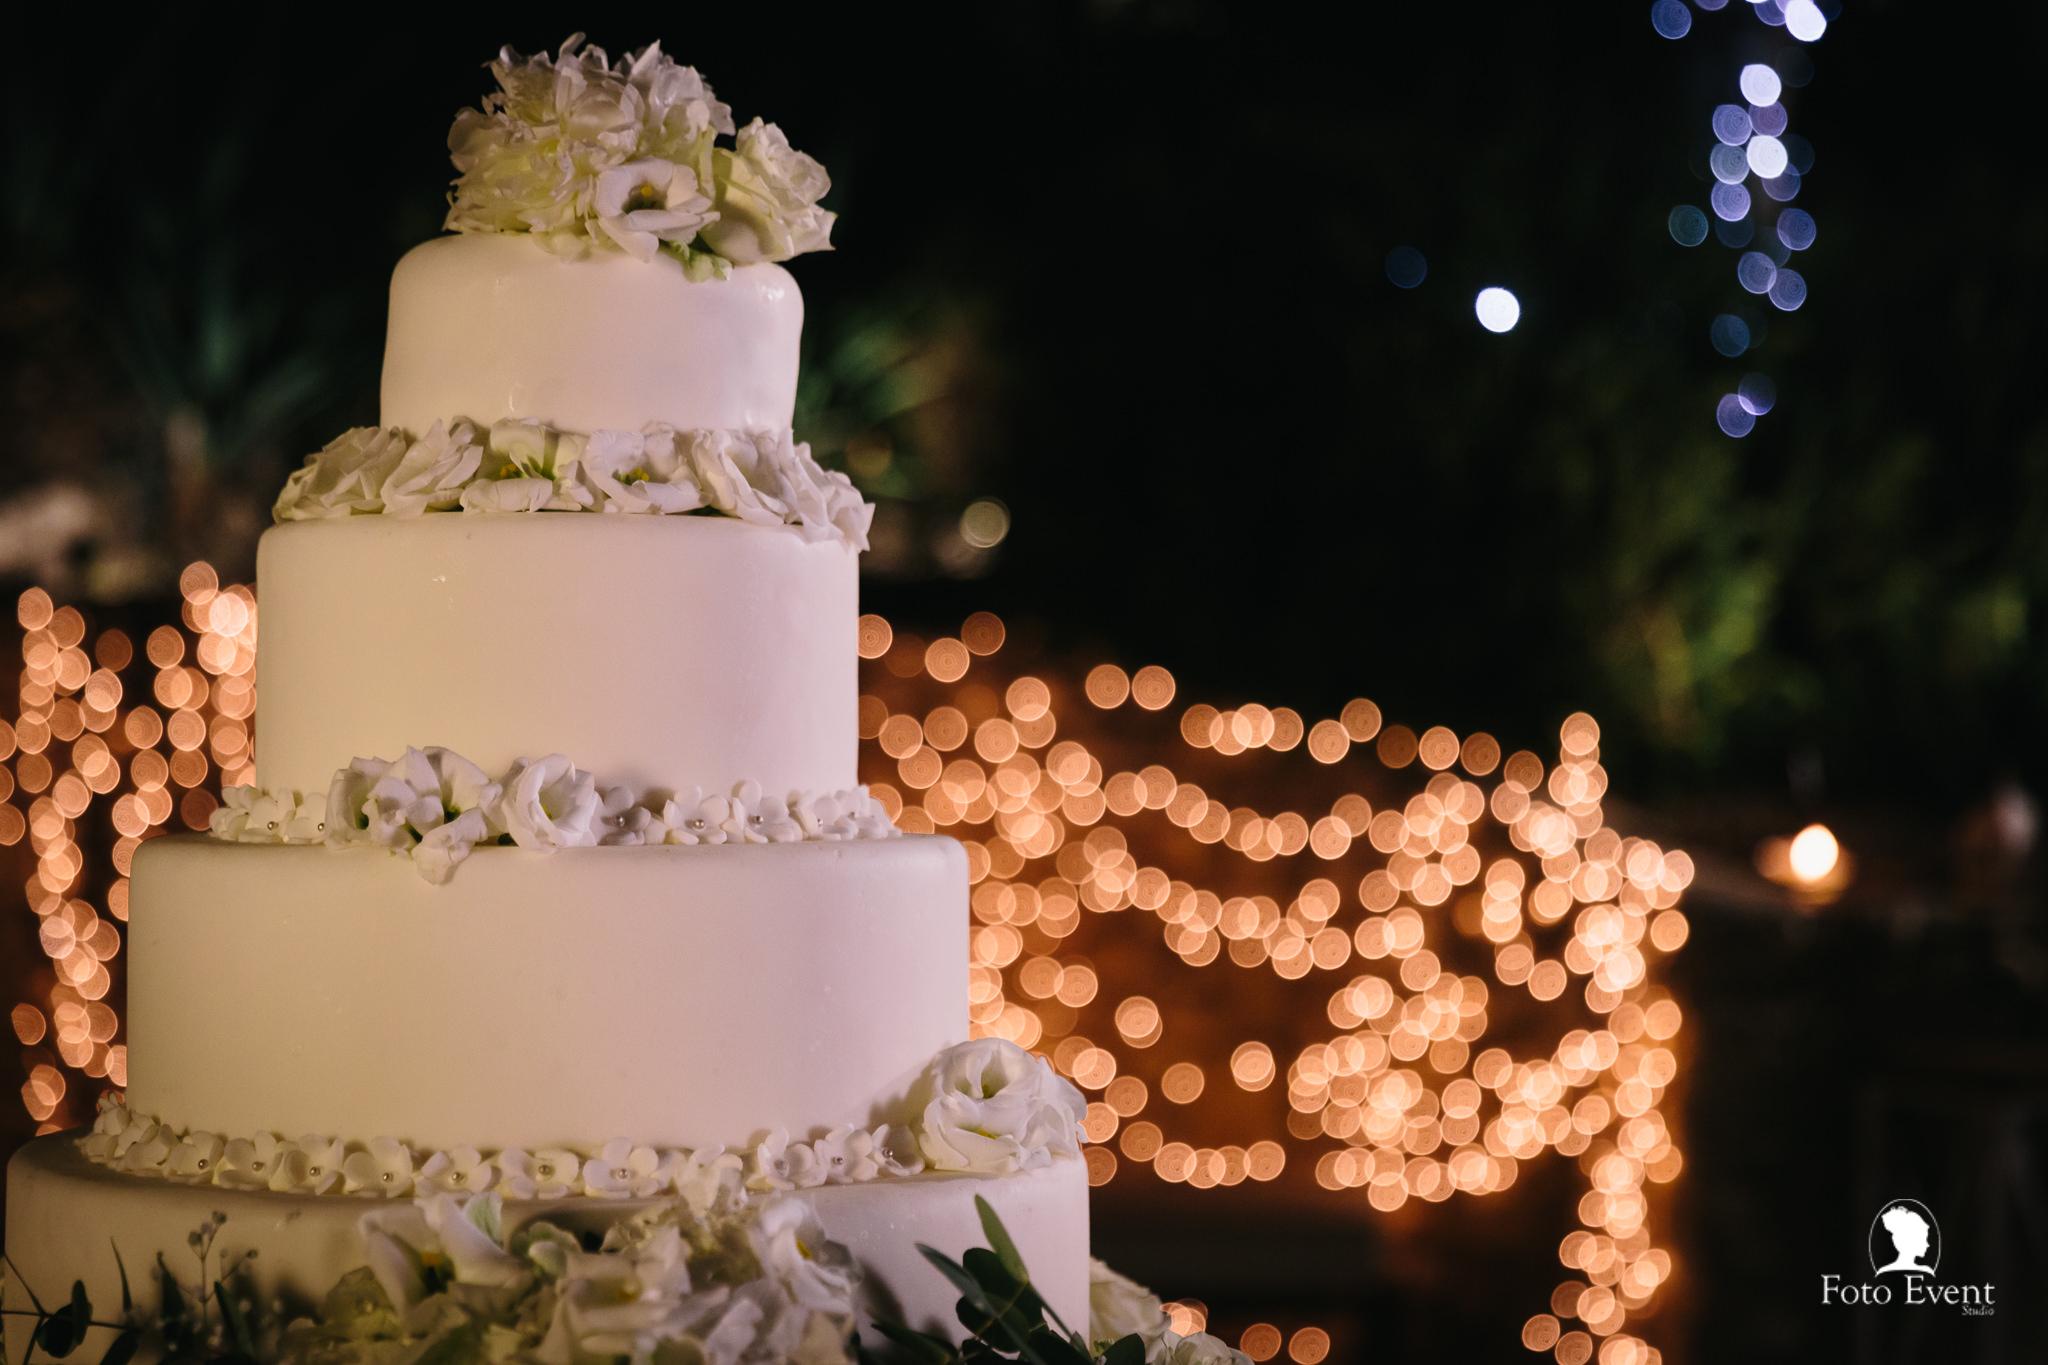 047-2019-08-23-Matrimonio-Lucia-e-Rosario-Scopelliti-5DE-2509